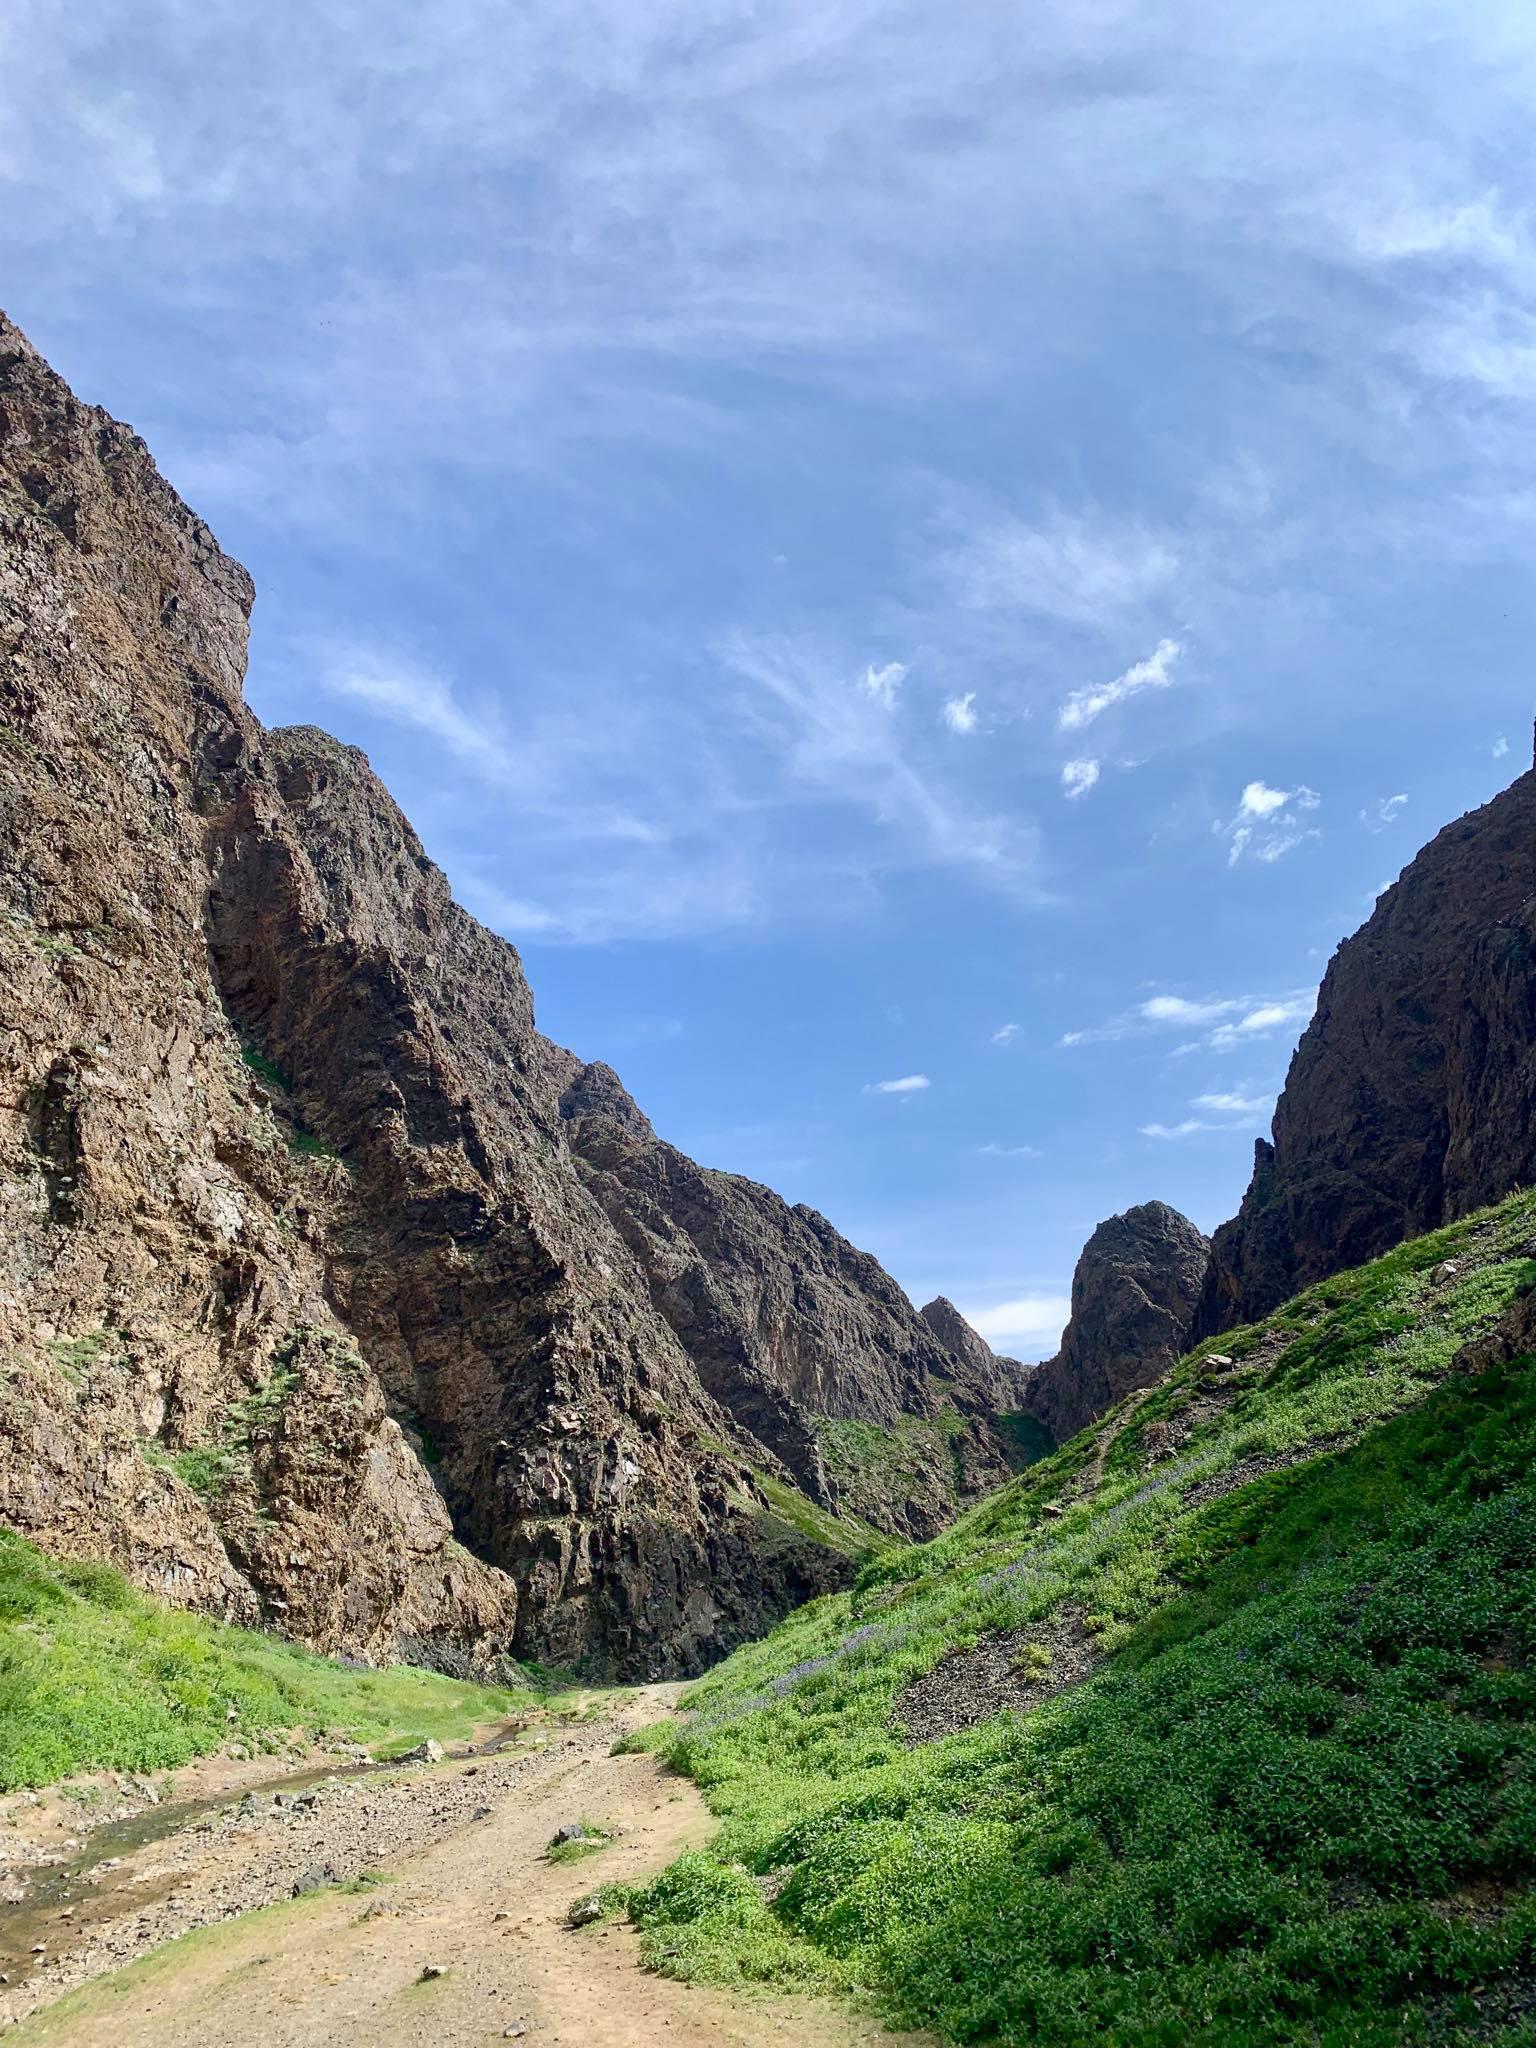 Kach Solo Travels in 2019 Horseback riding trip to the Gobi Gurvan Saikhan National Park16.jpg